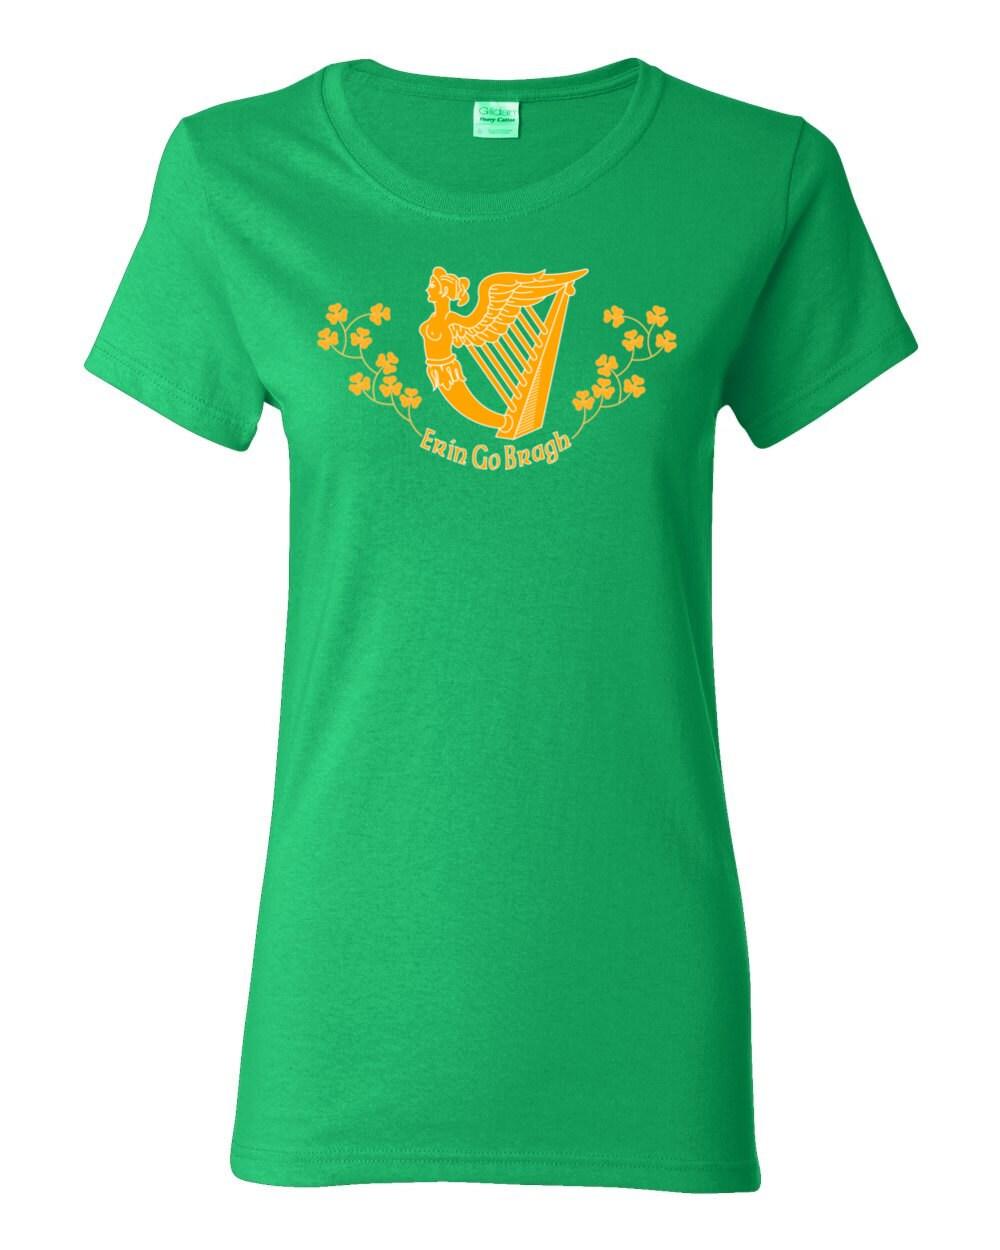 St. Patrick's Day T-shirt - Erin Go Bragh - Ireland Forever - Irish Womens T-shirt